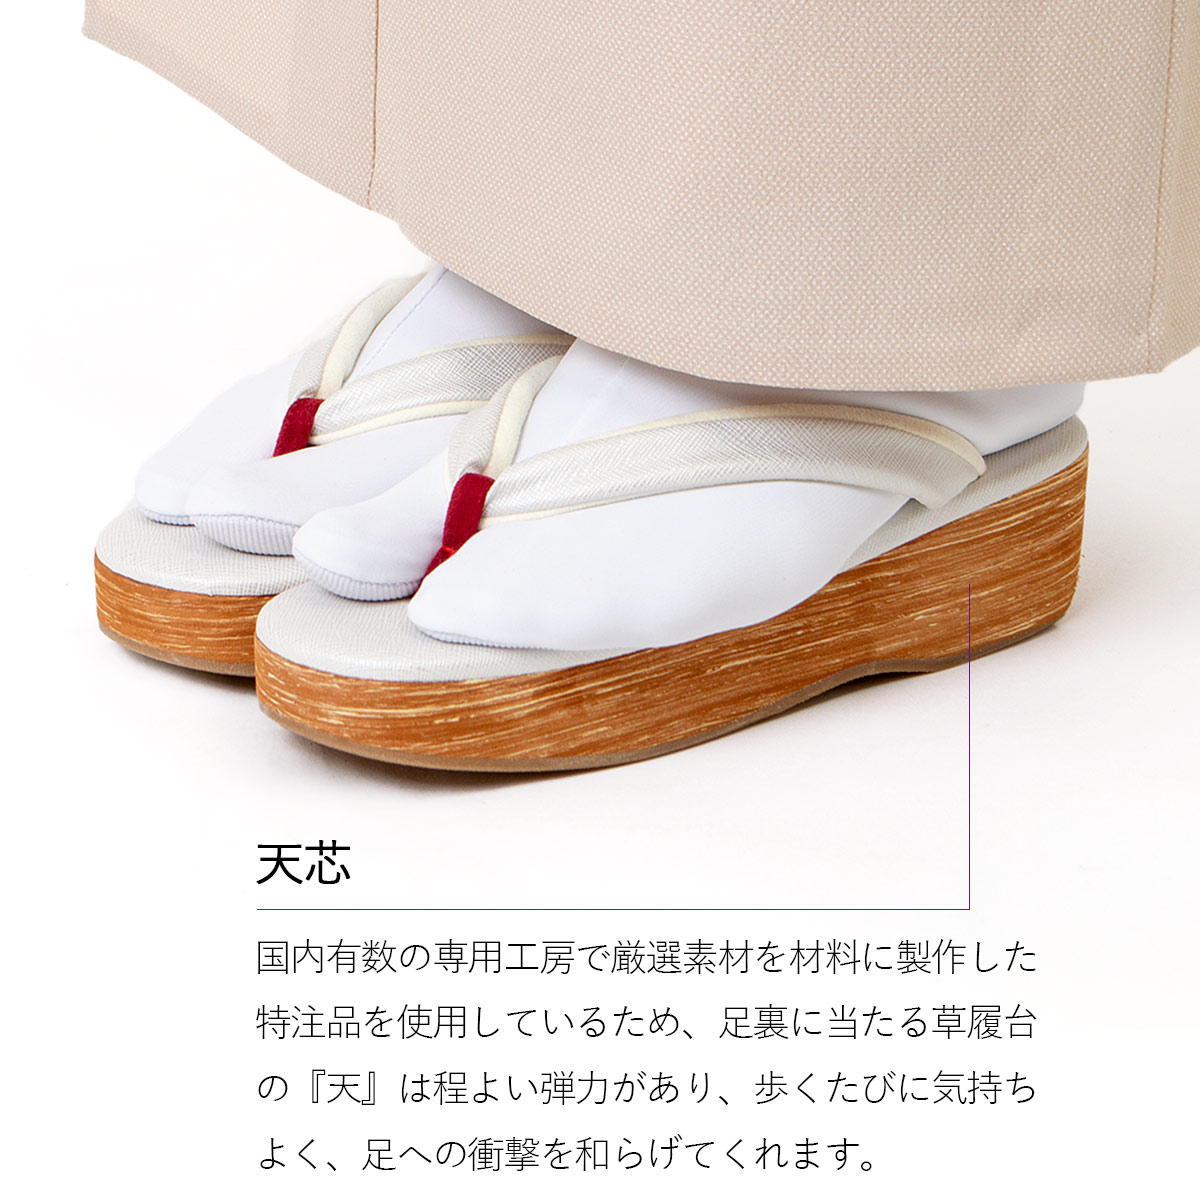 . HAKU 草履 NO.104 |ホワイト